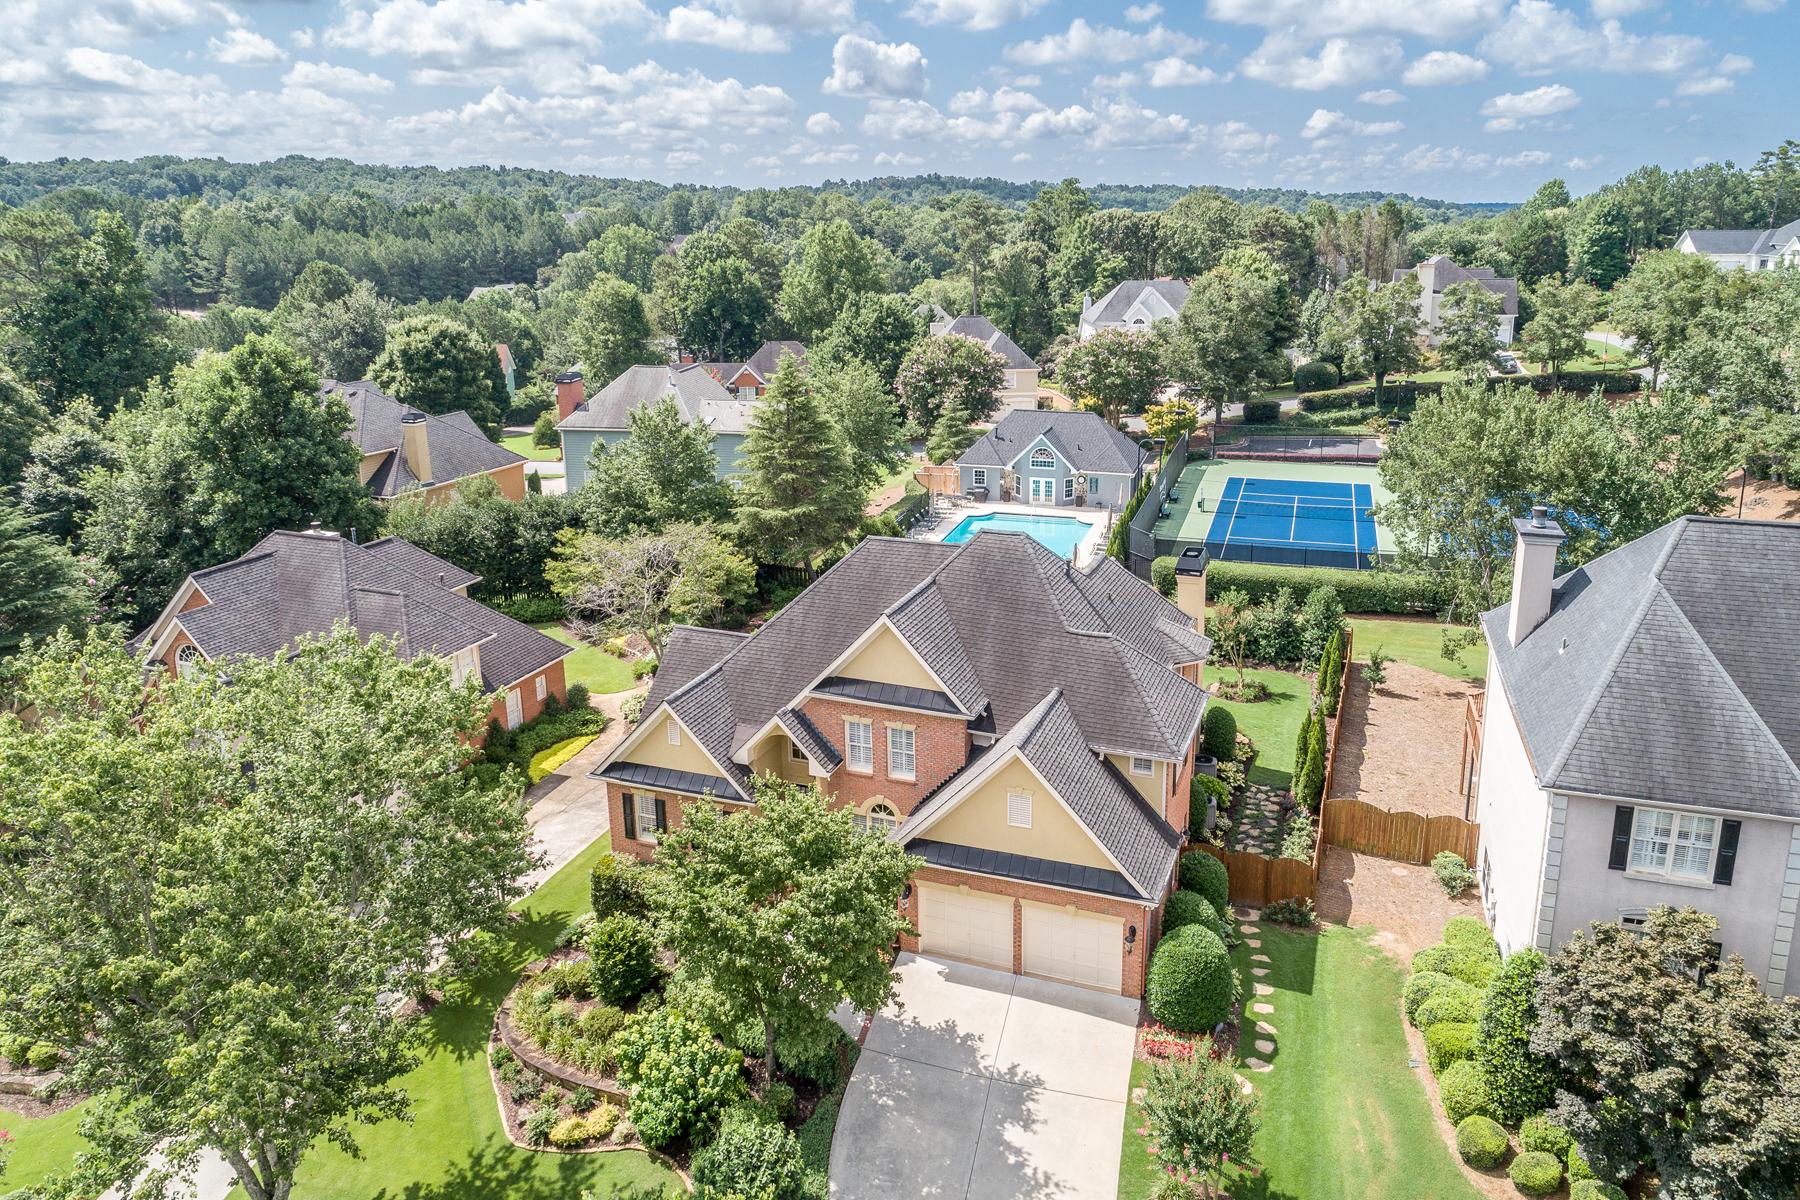 Single Family Home for Sale at Pristine Master on Main Home in the Bridgewater Community 3375 Merganser Ln Alpharetta, Georgia 30022 United States